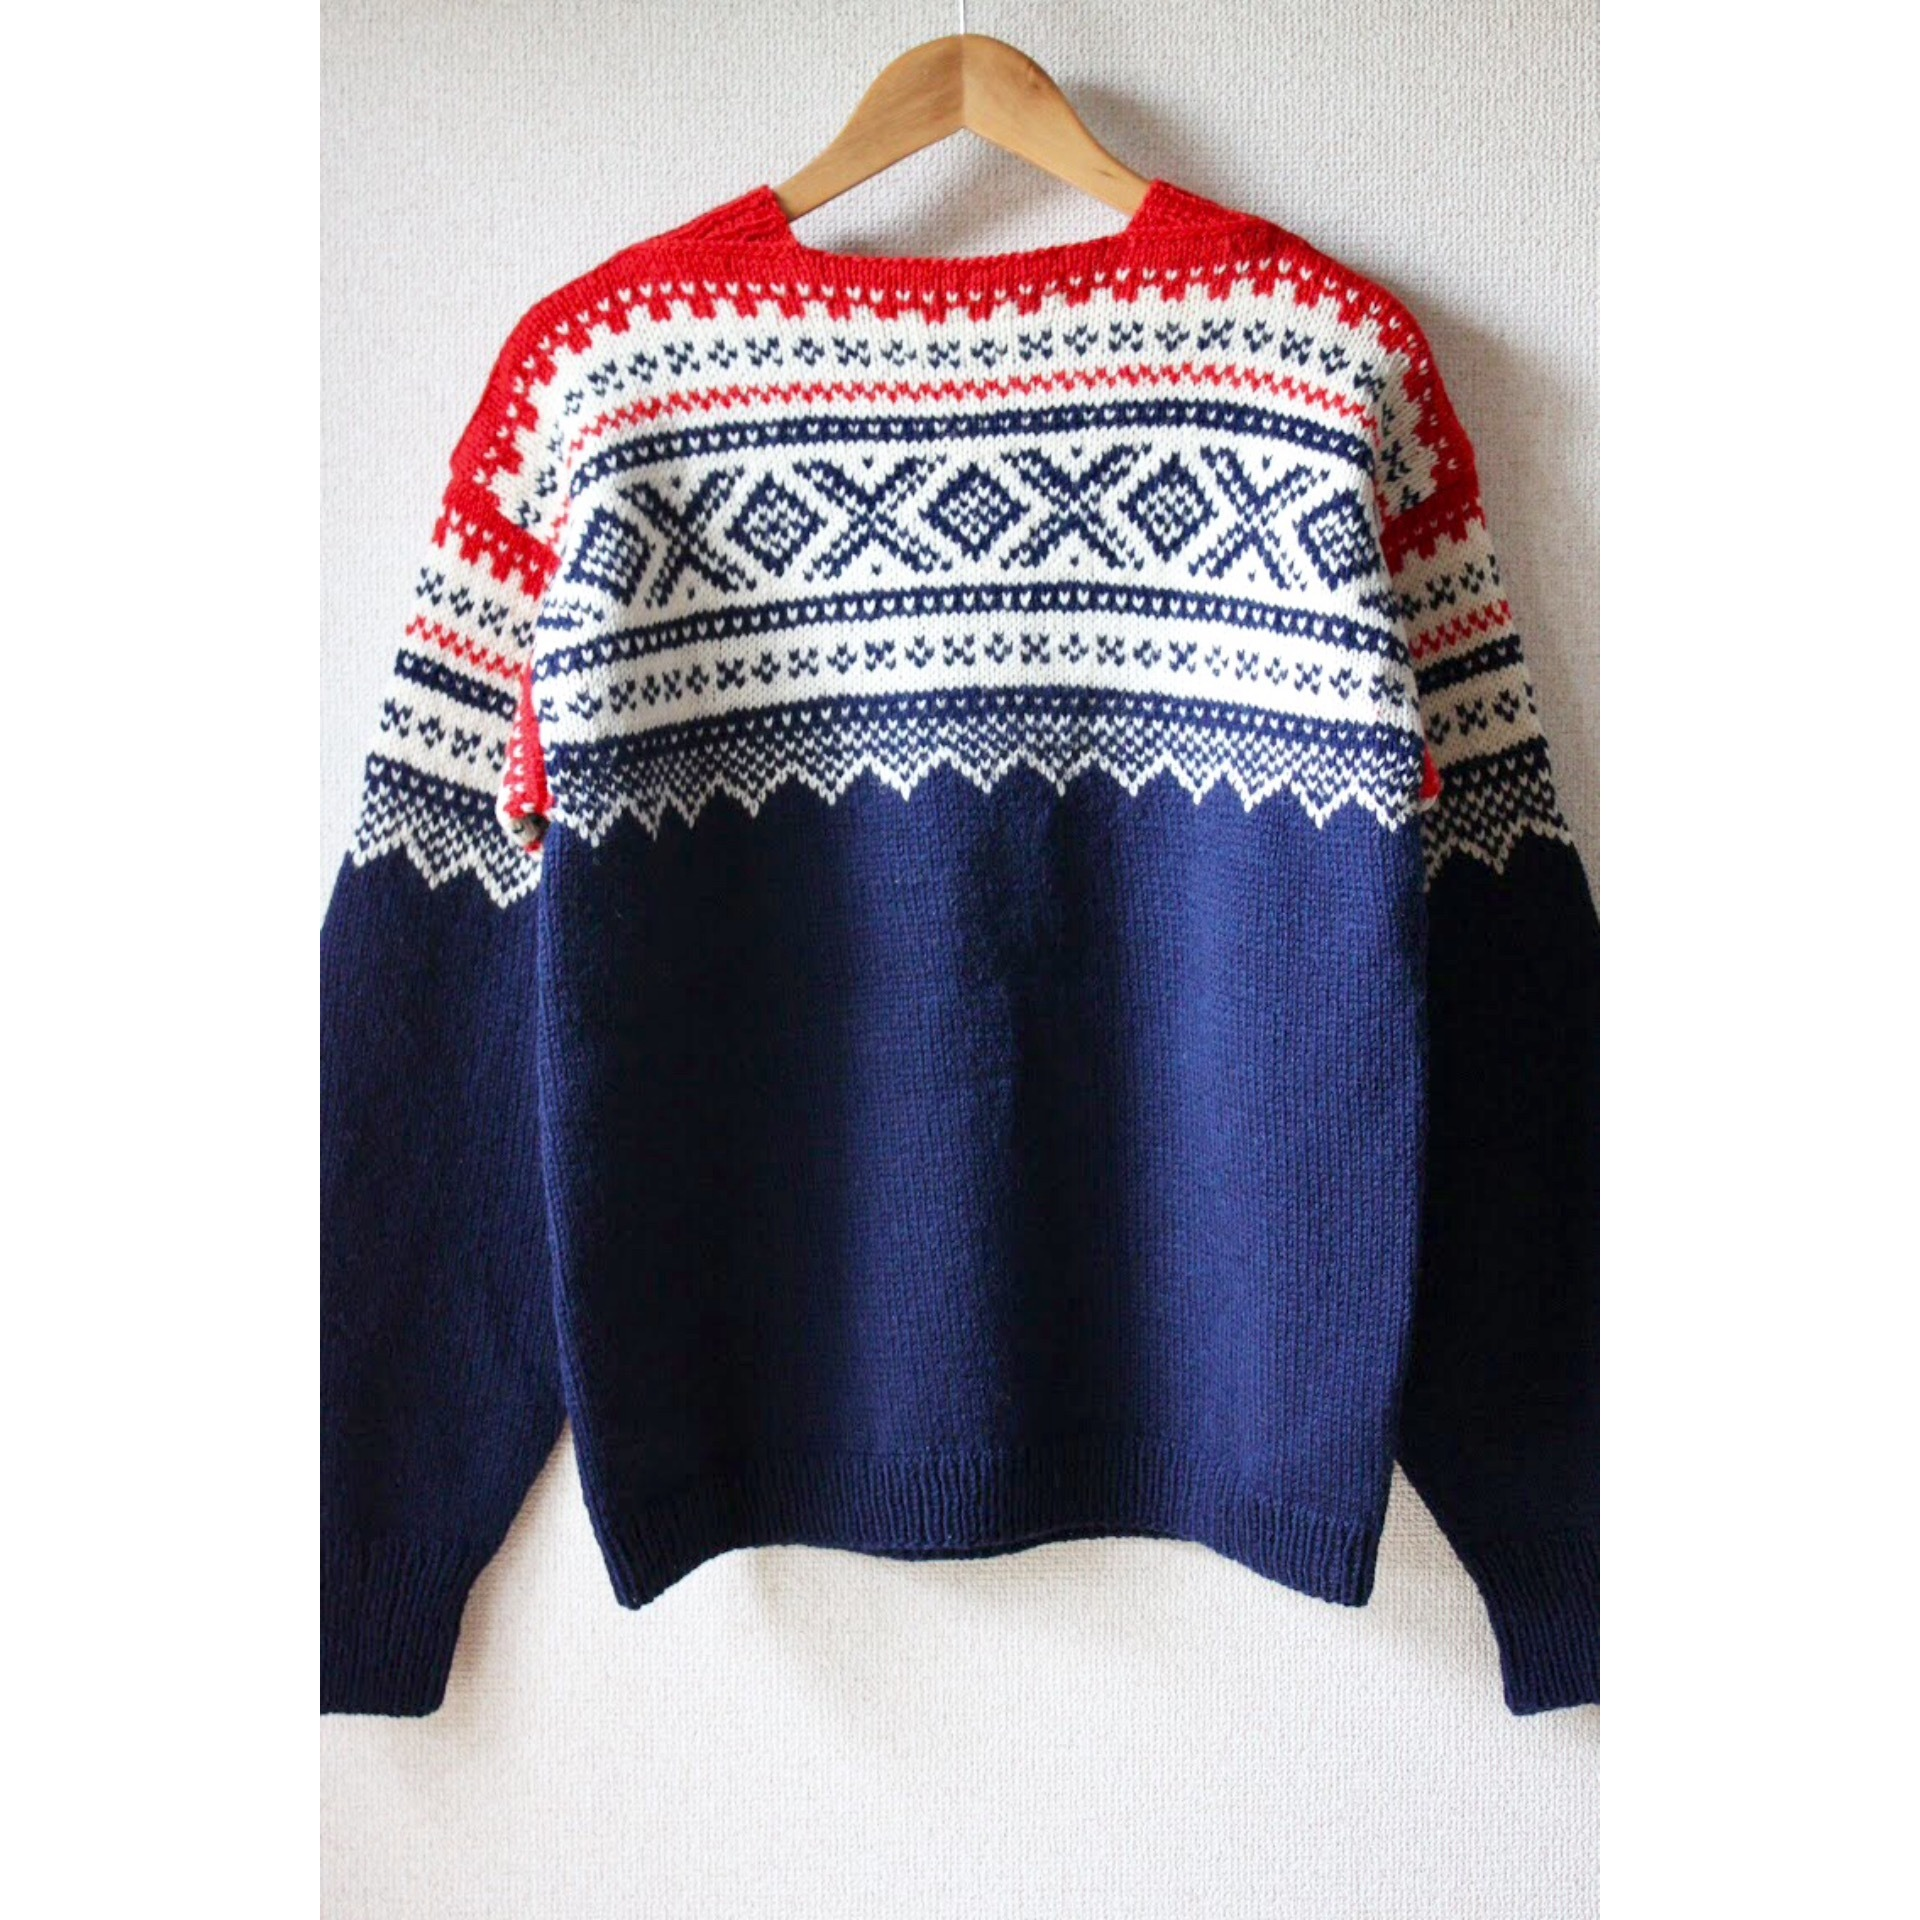 Vintage nordic sweater